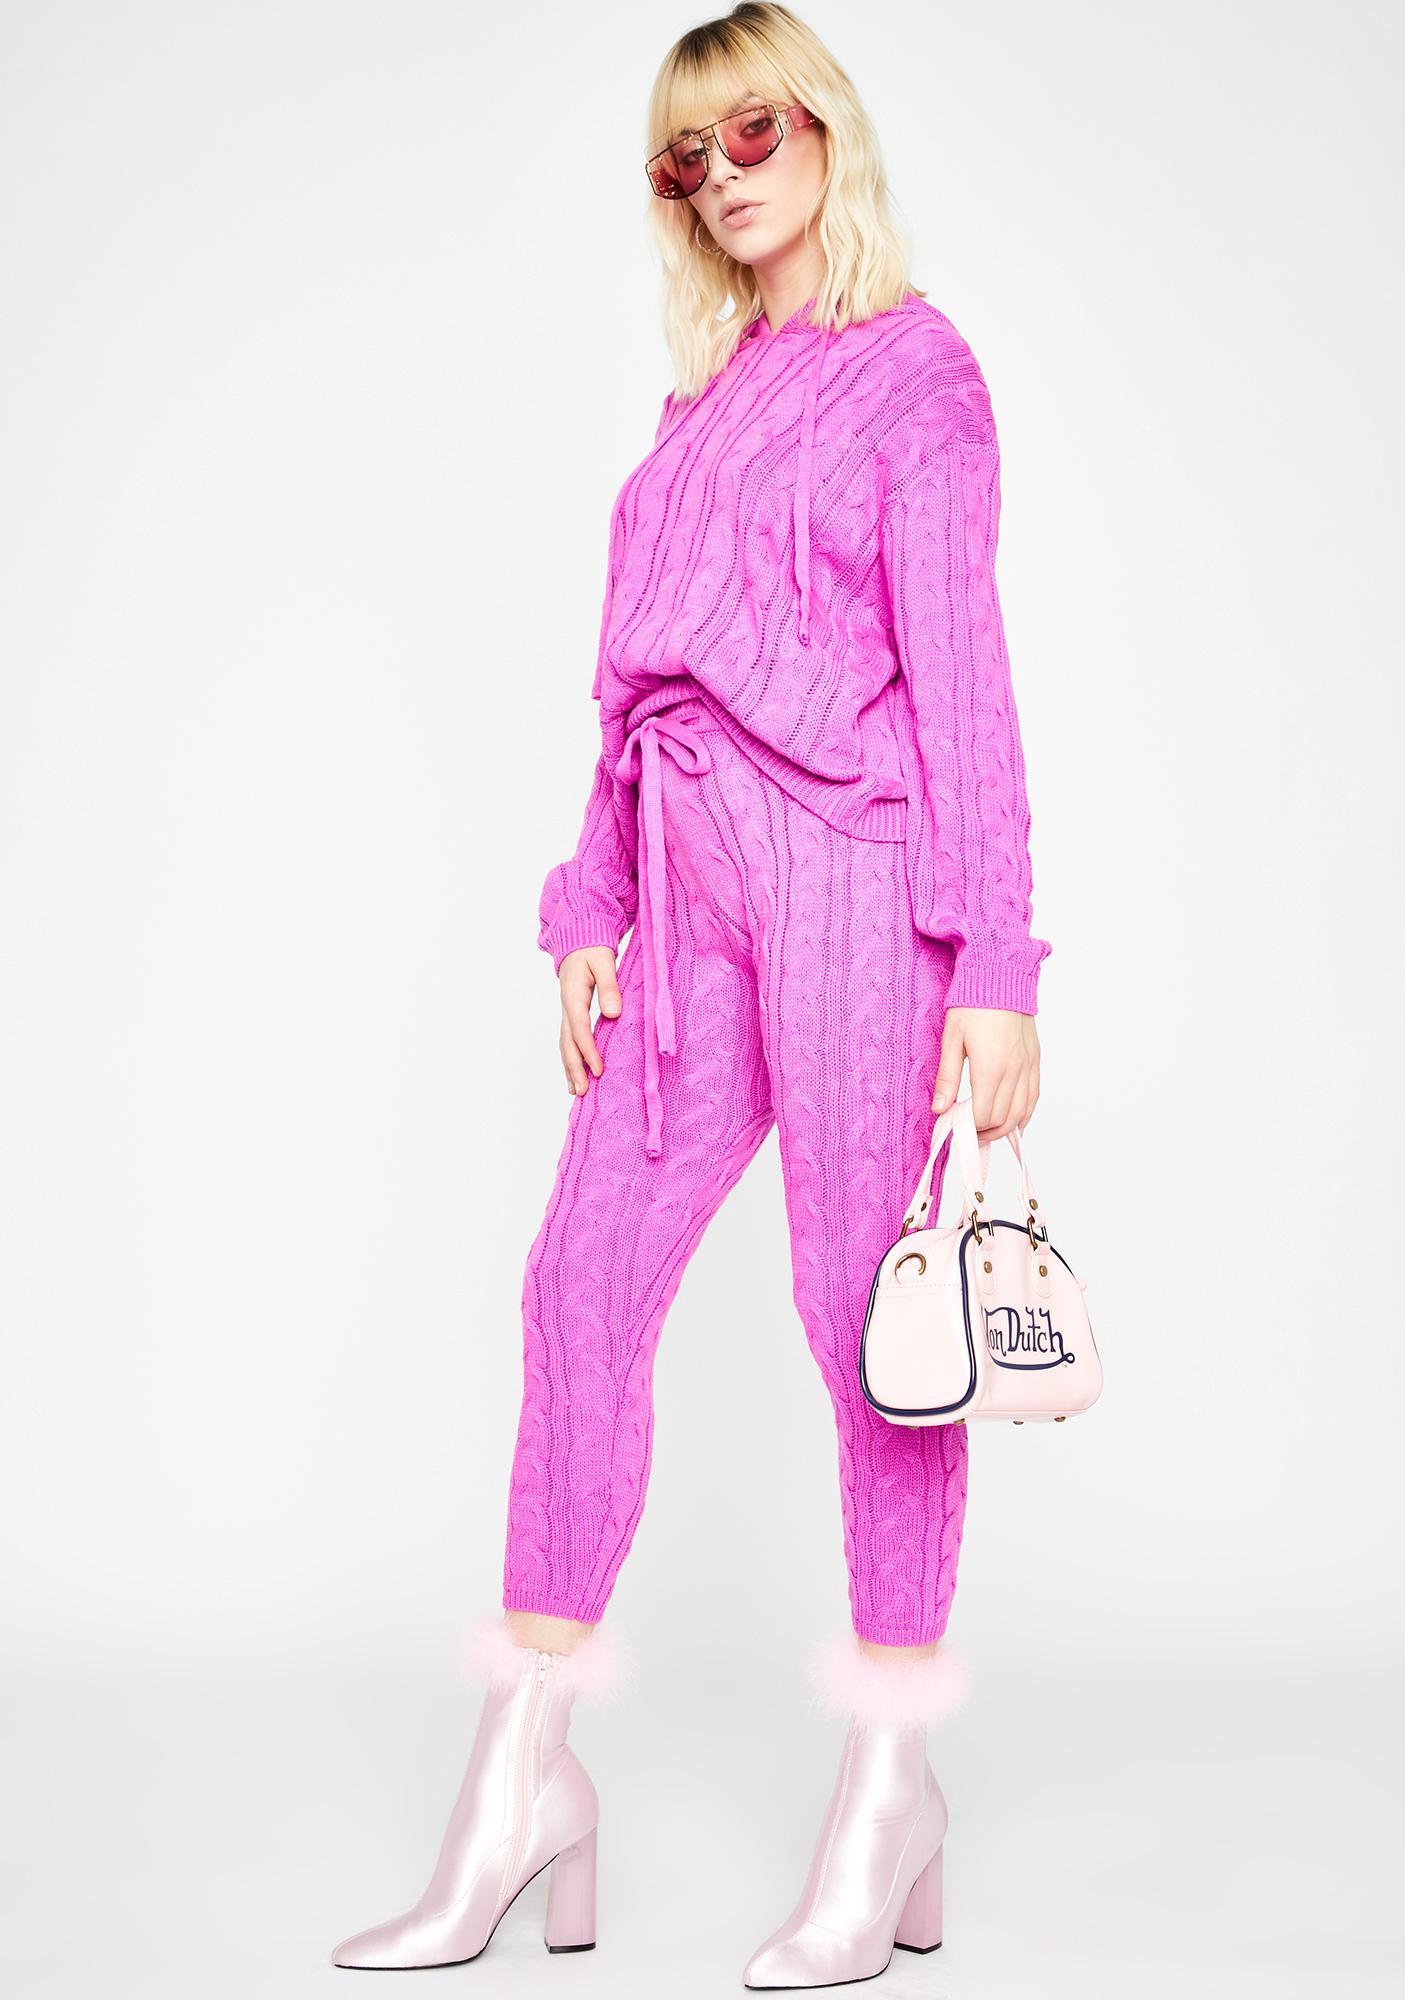 Cozy Kween Knit Set